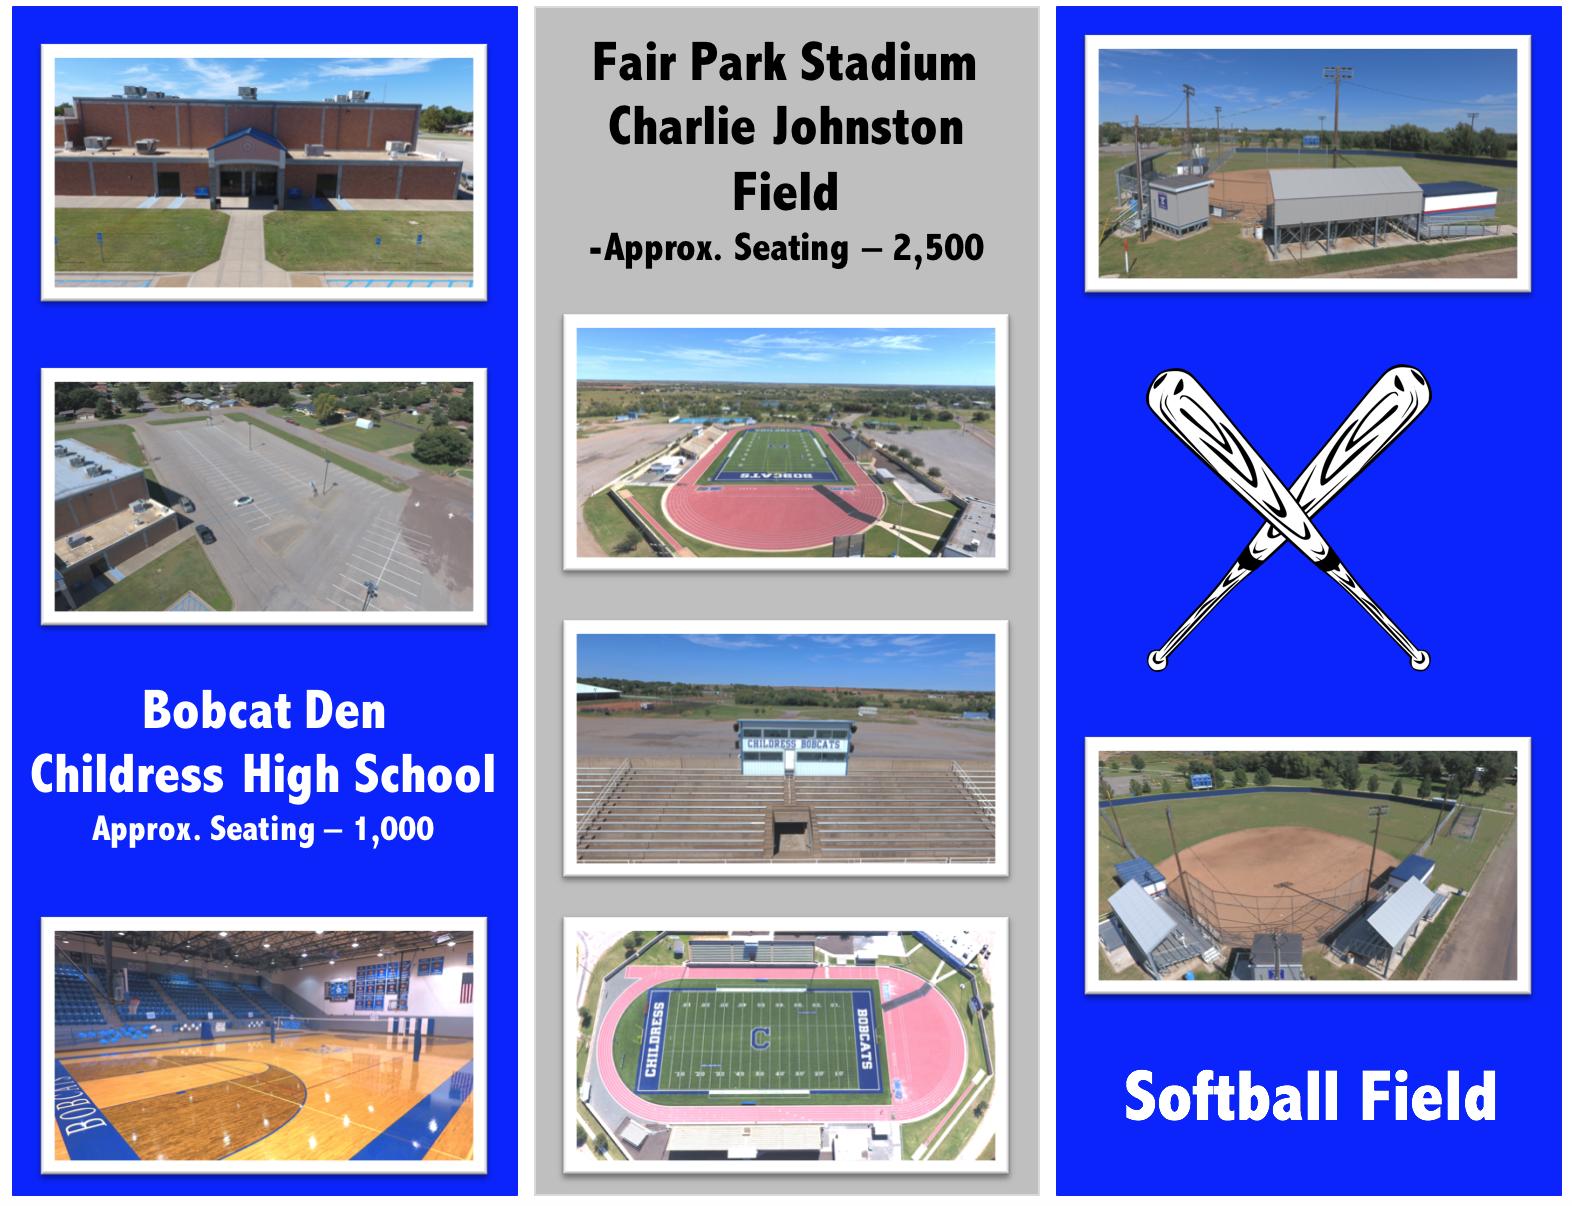 Stadiums information